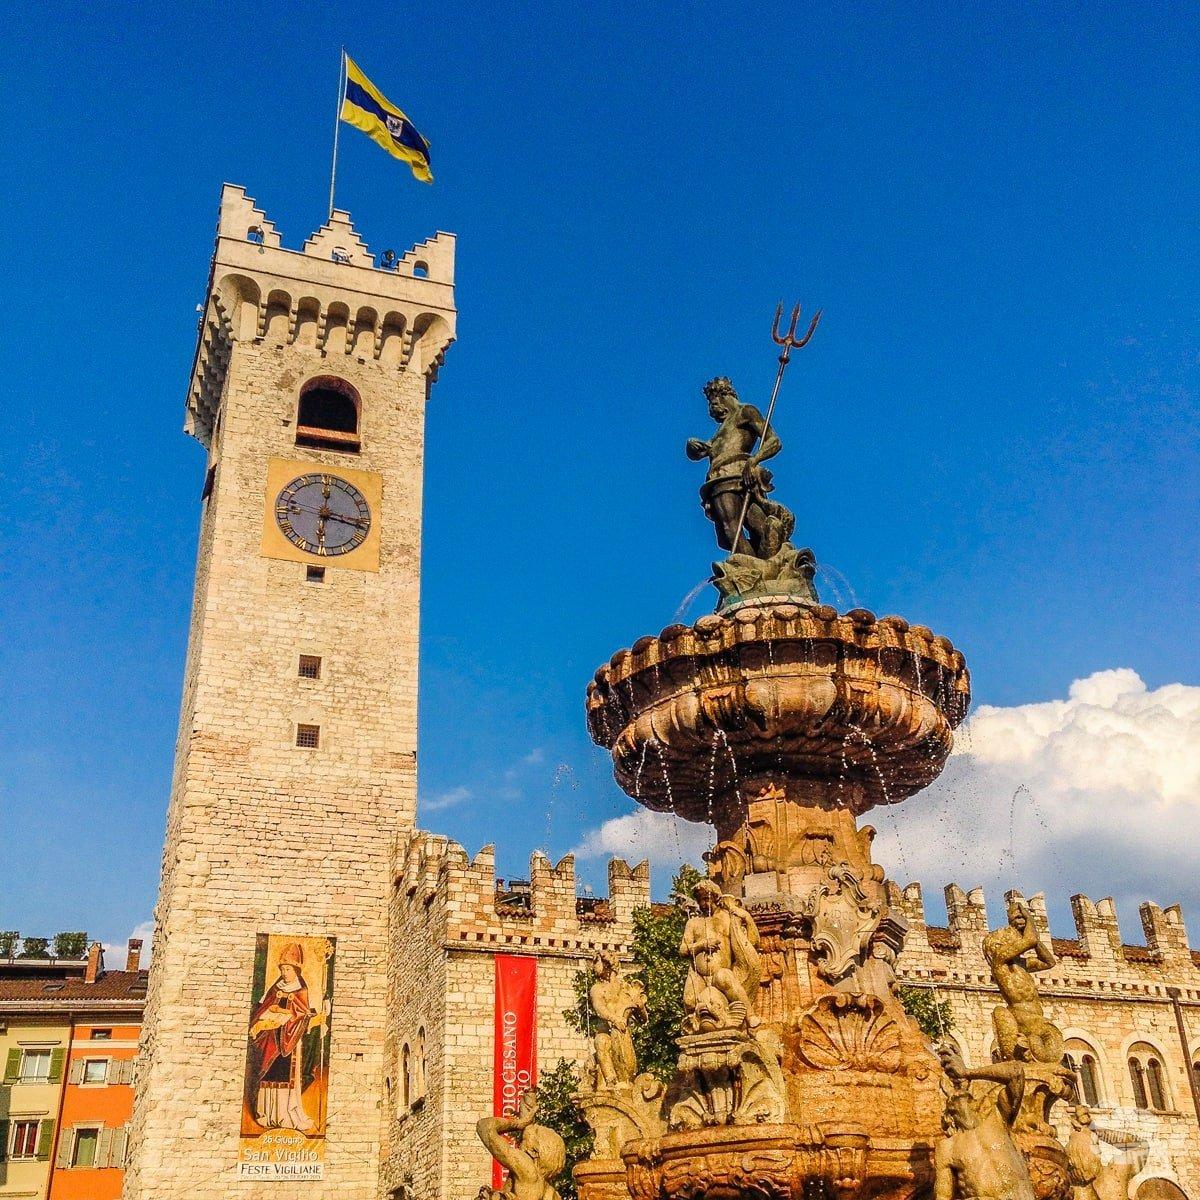 The main square of Trento